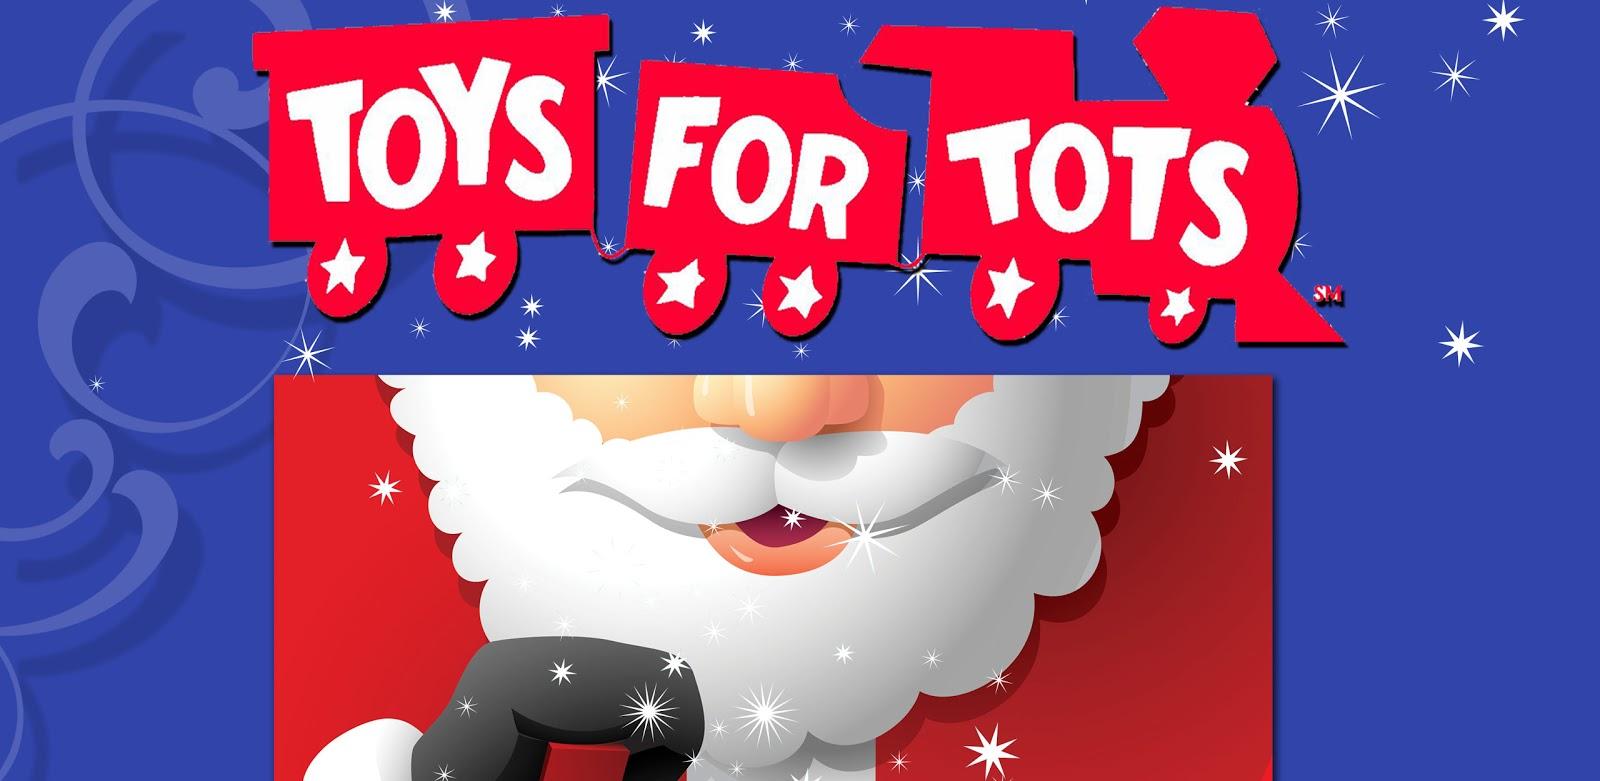 Toyrs For Tots : Owassoisms